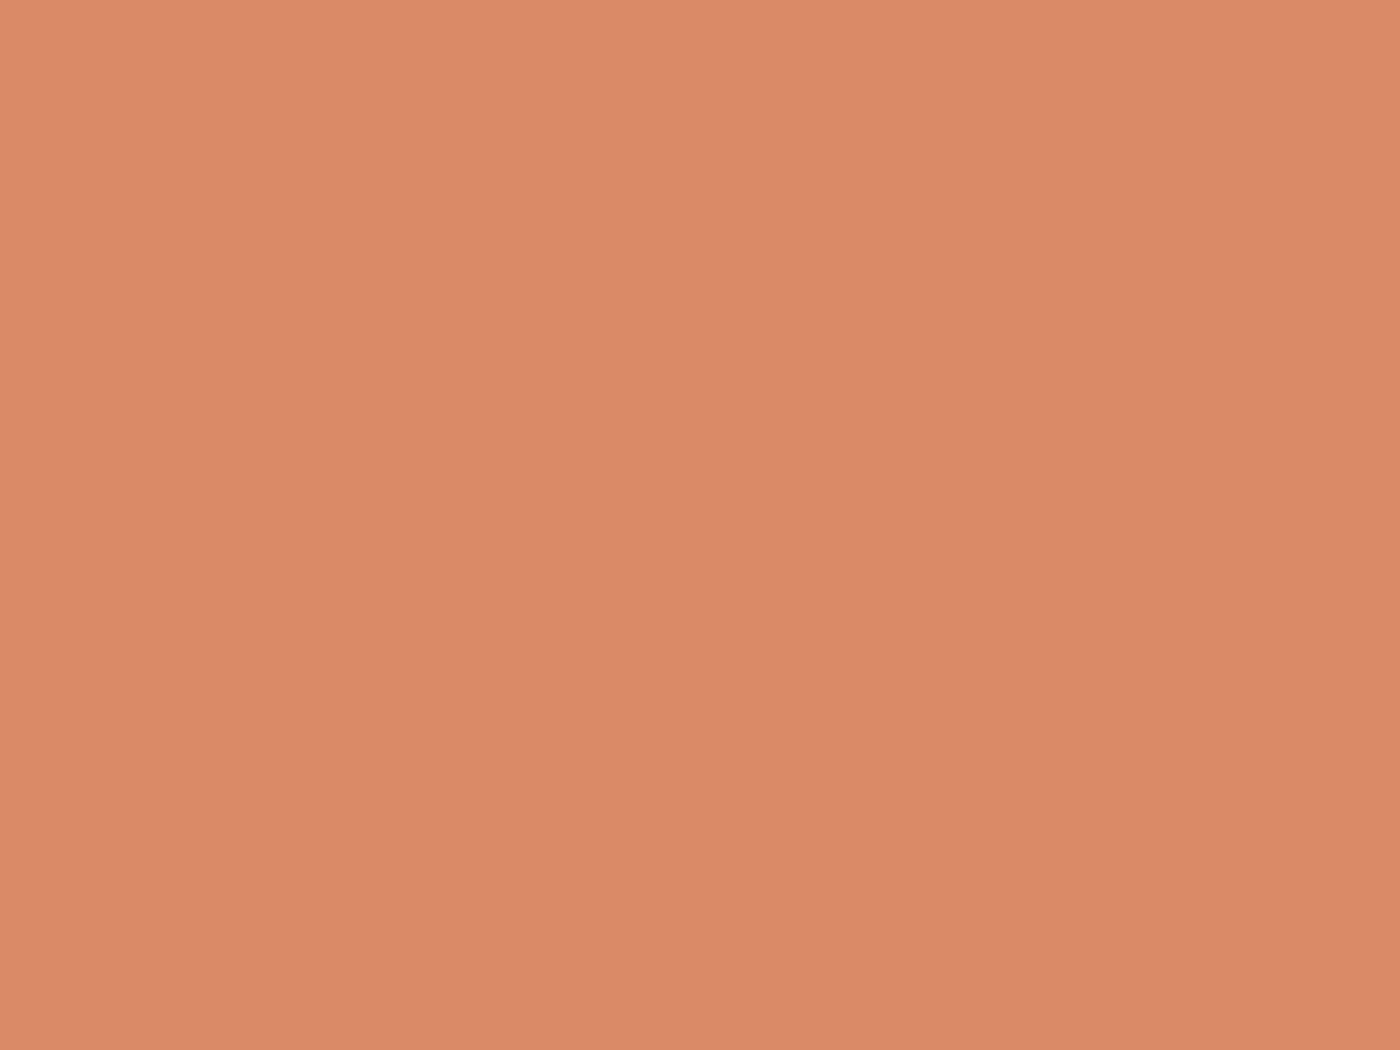 1400x1050 Pale Copper Solid Color Background